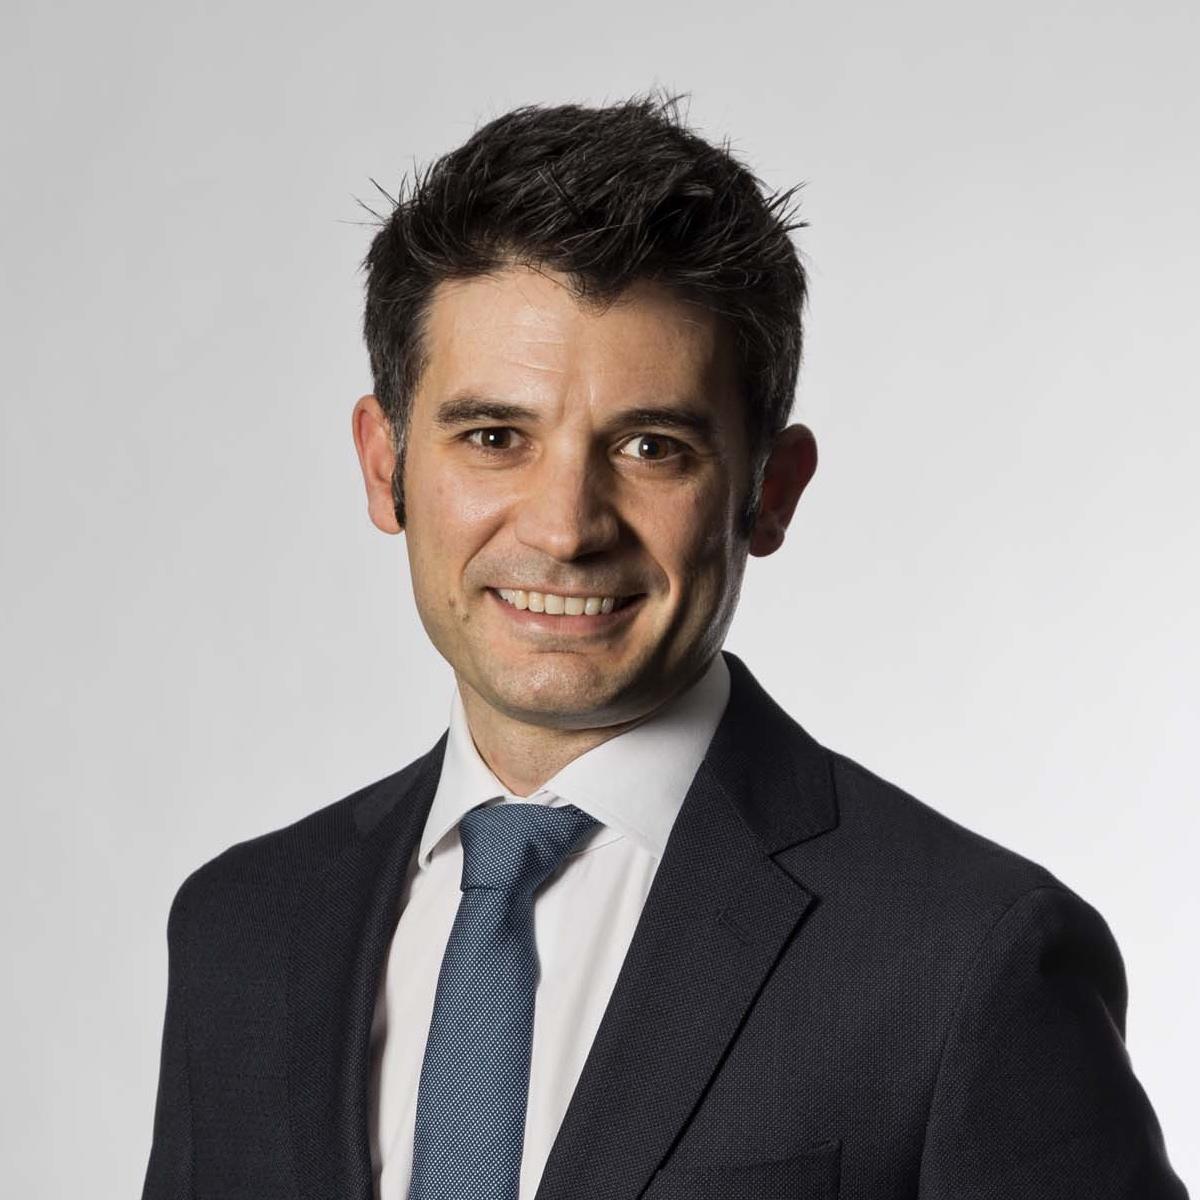 Jordi Sogas Quílez - Analista de Fondos Externos en Crèdit Andorrà